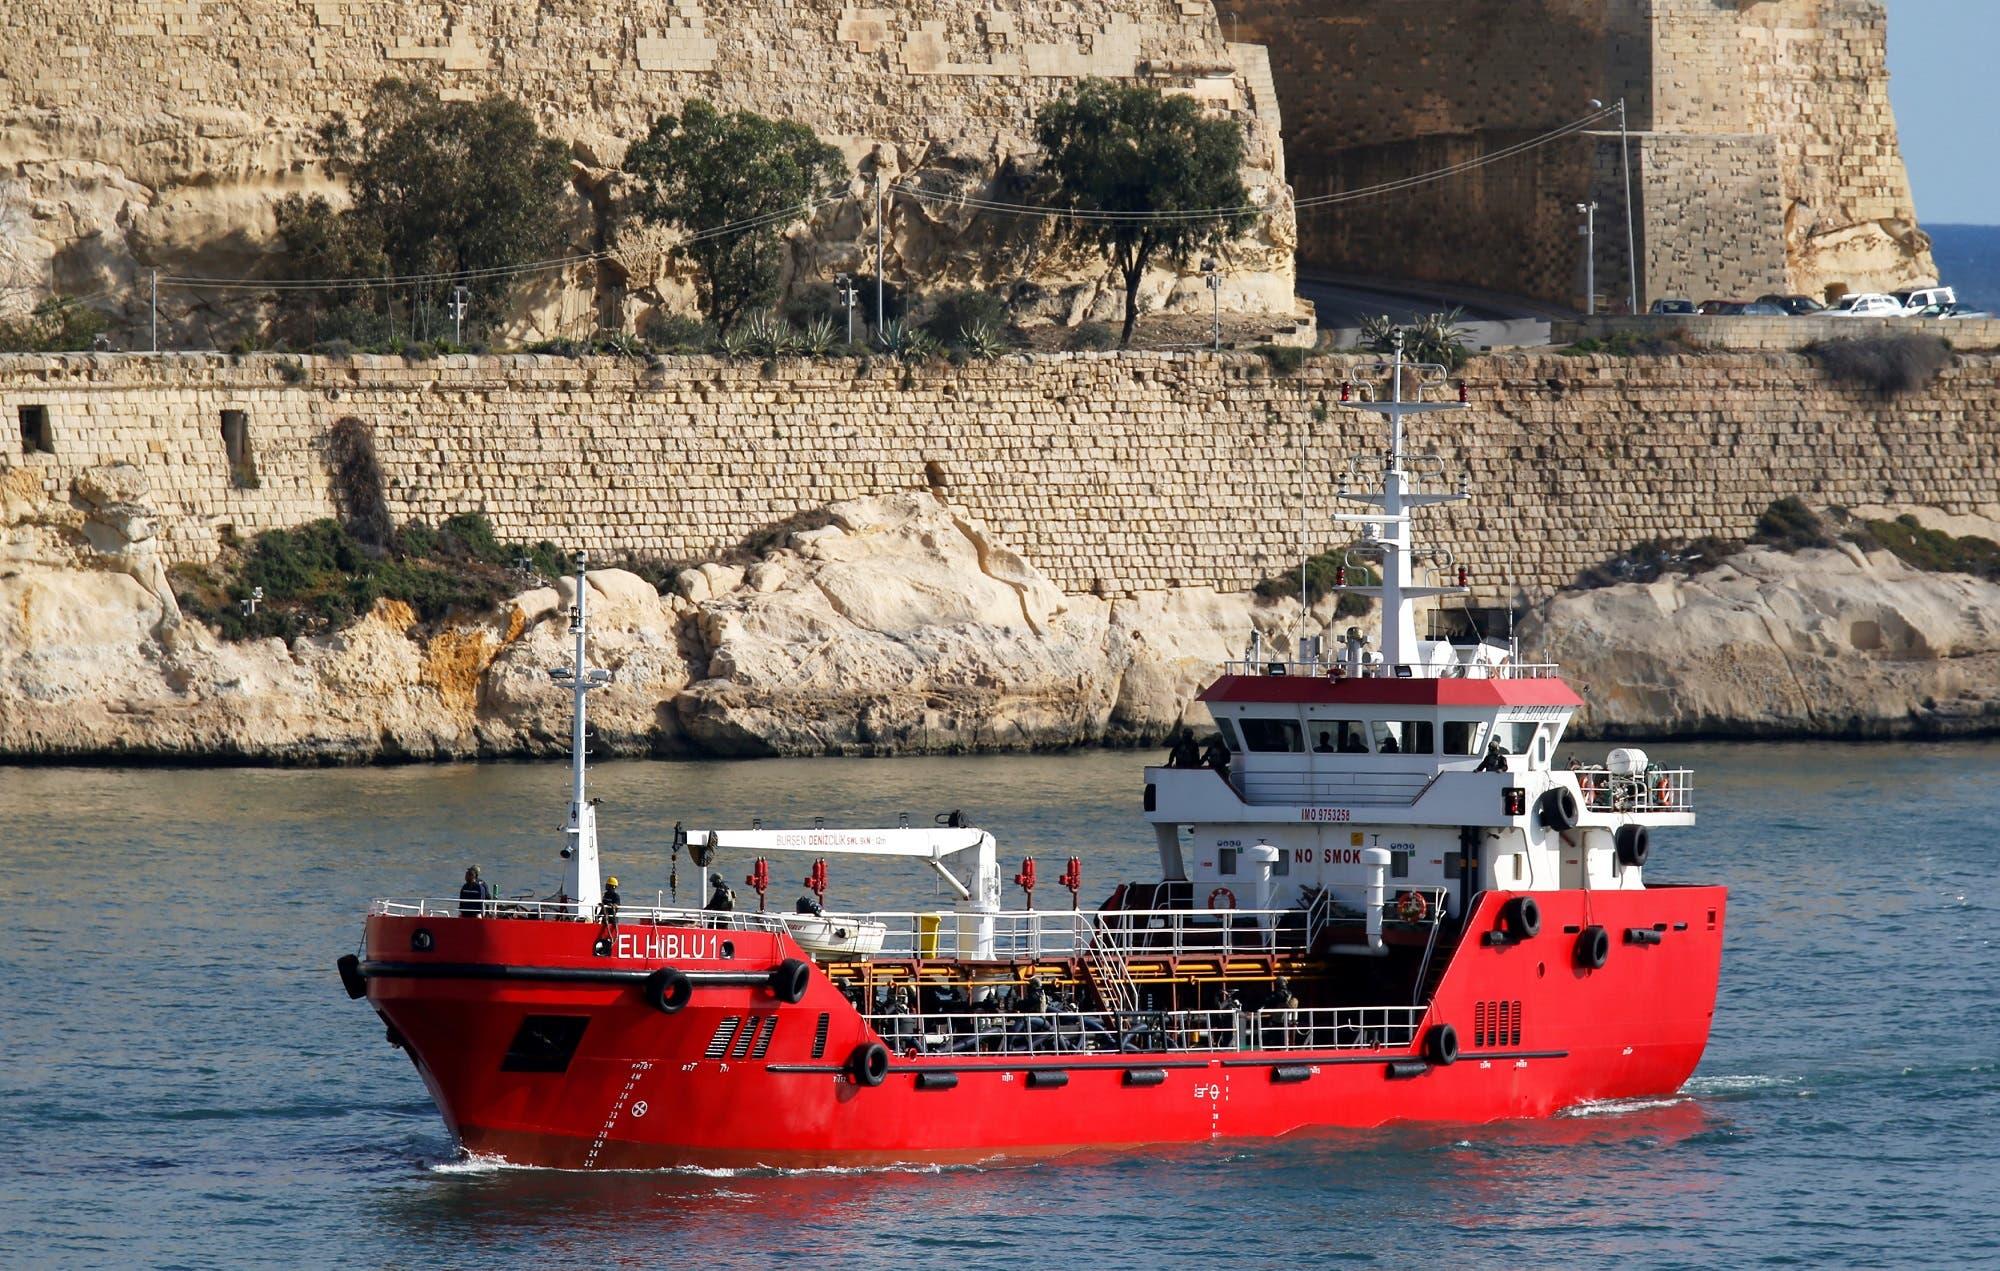 The merchant ship Elhiblu 1 arrives in Valletta's Grand Harbour, Malta on March 28, 2019. (Reuters)